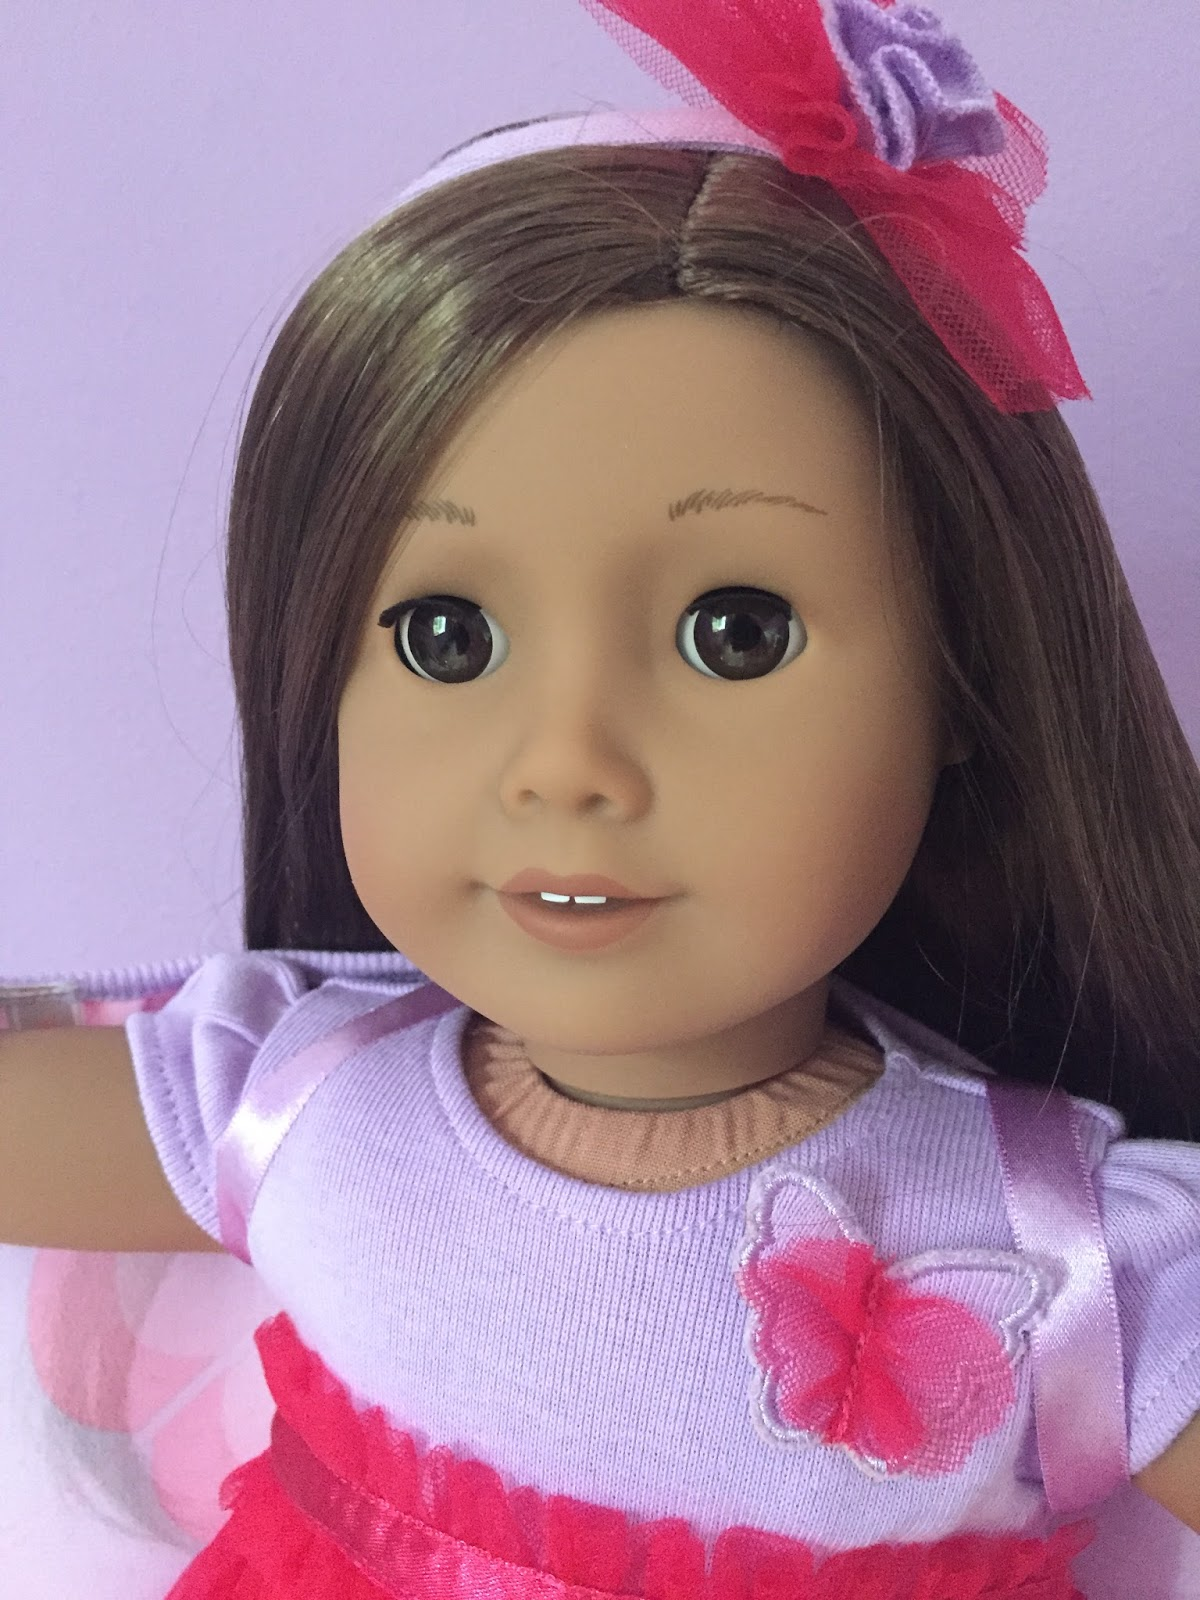 american girl cuties my new doll myag 29. Black Bedroom Furniture Sets. Home Design Ideas